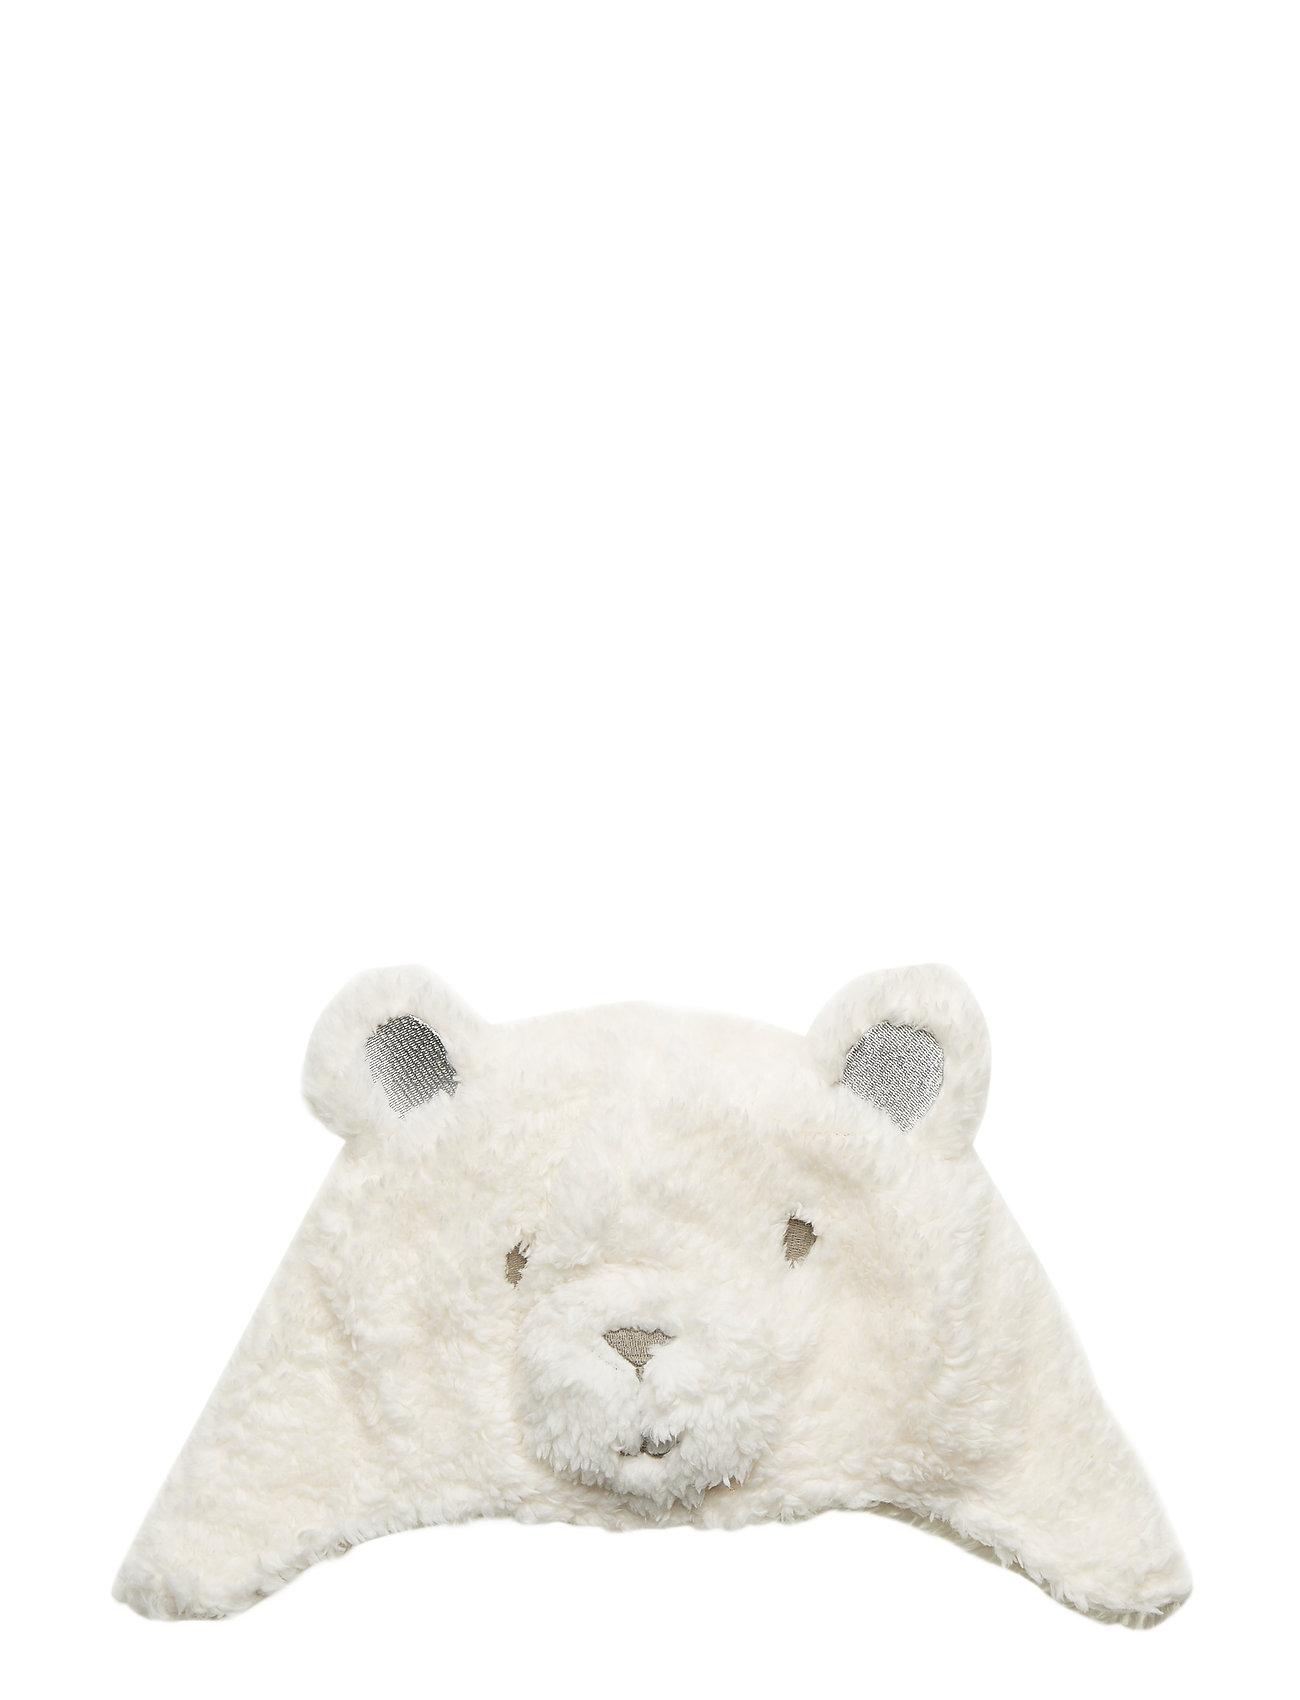 GAP Toddler Polar Bear Trapper Hat - IVORY FROST